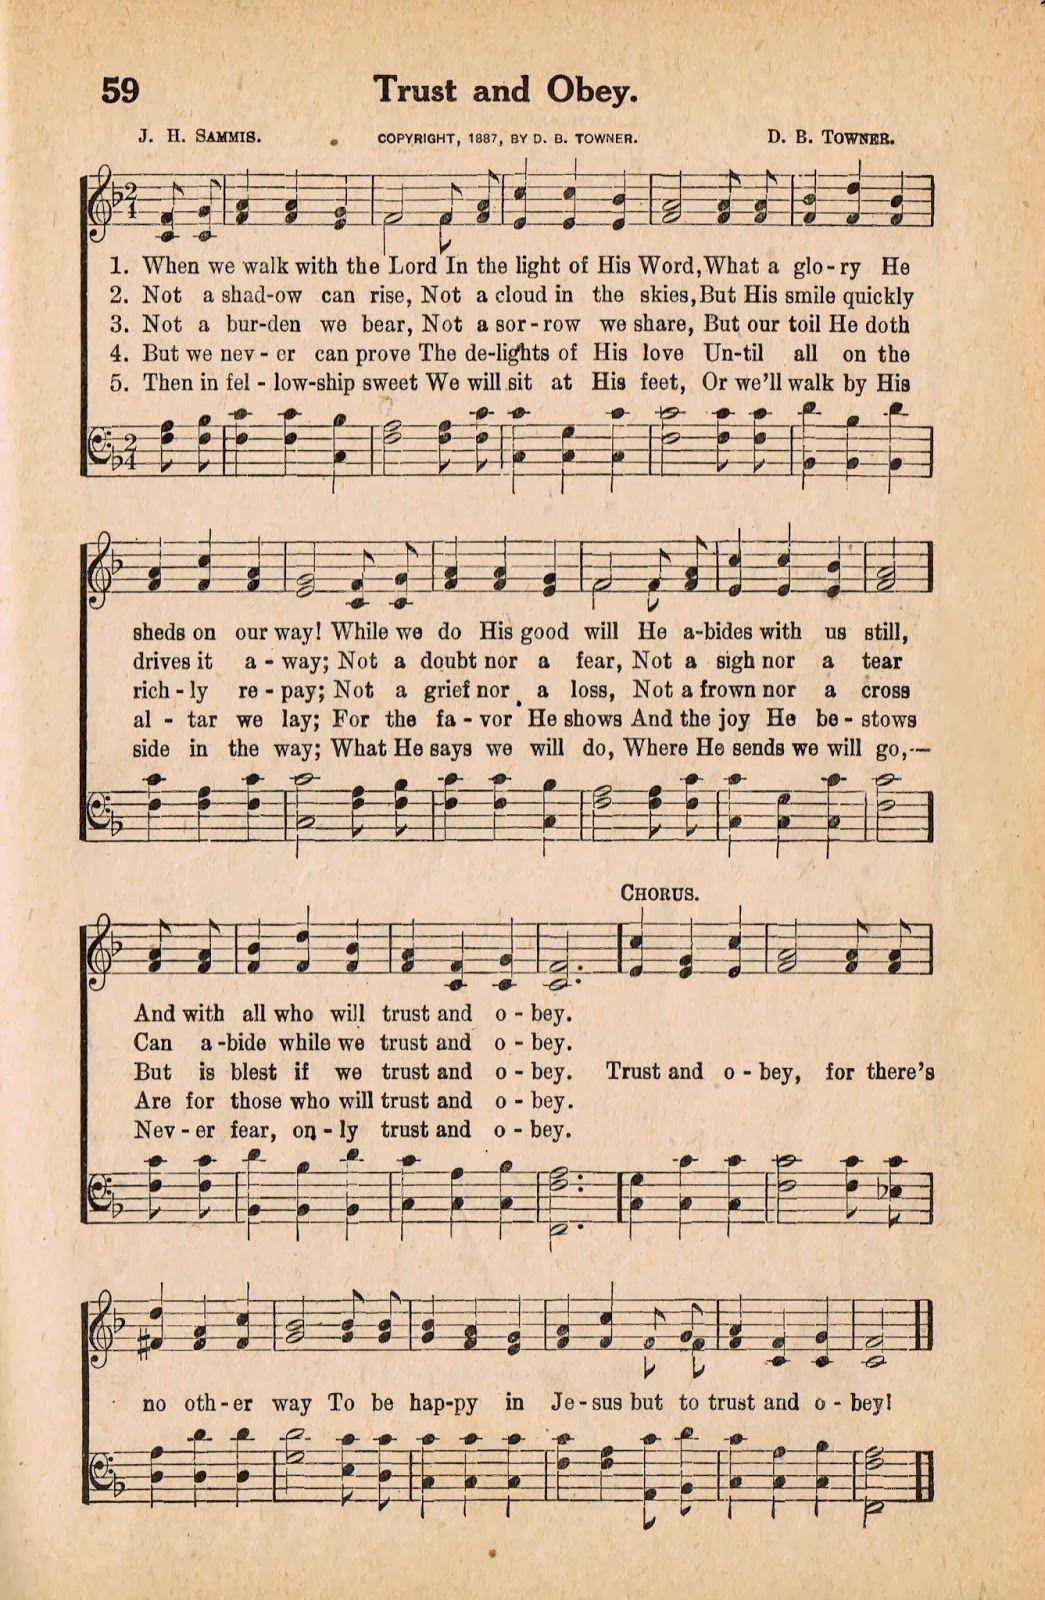 Methodist Hymn Lyrics - Apps on Google Play